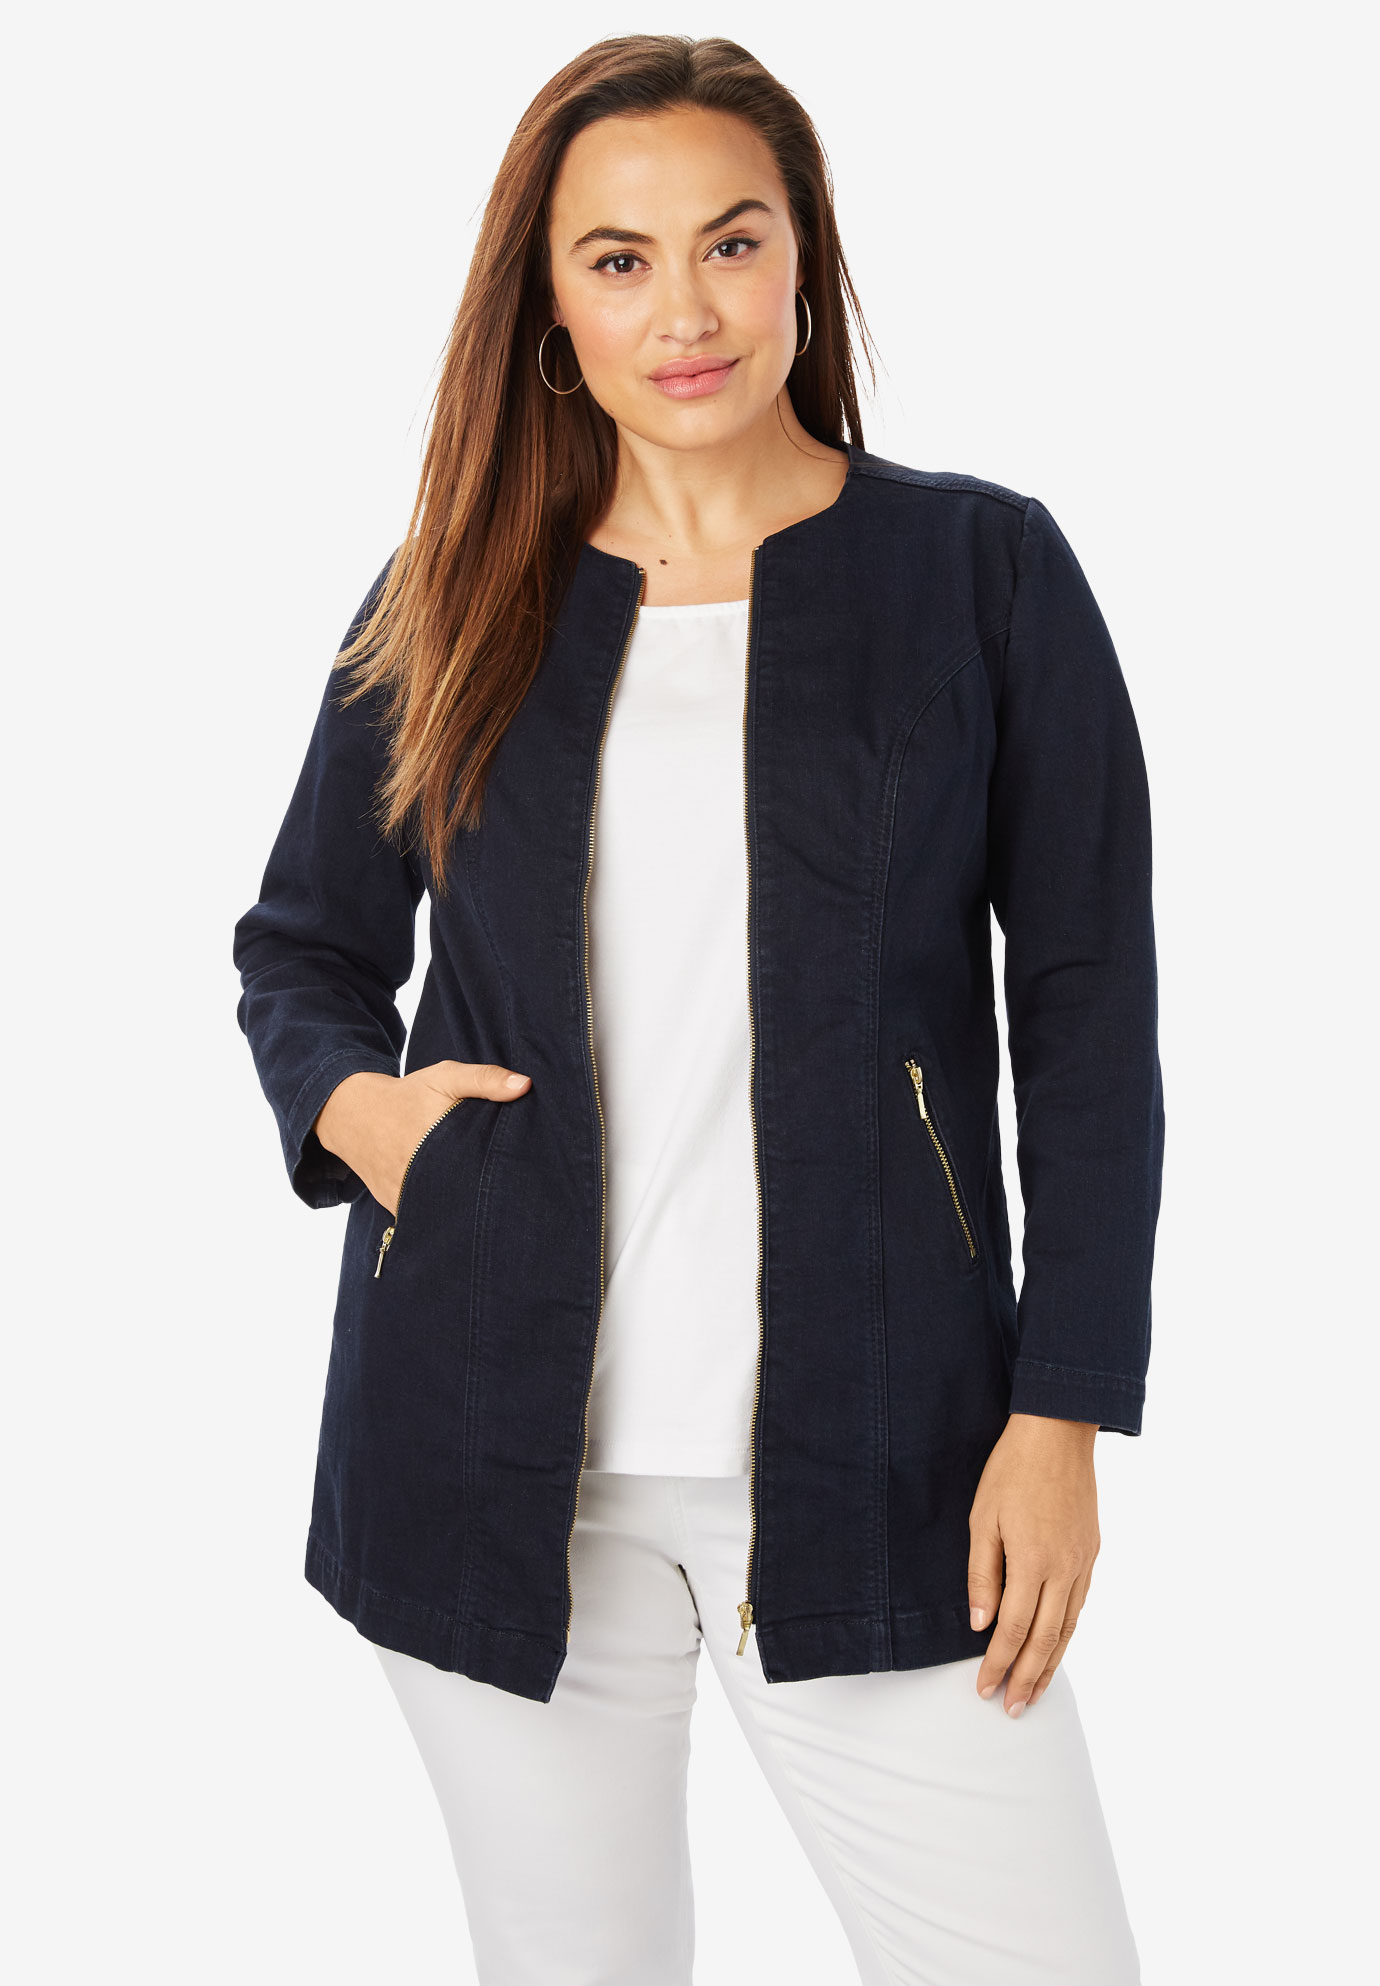 e95958161e14 Refined Denim Jacket| Plus Size Casual Jackets | Jessica London